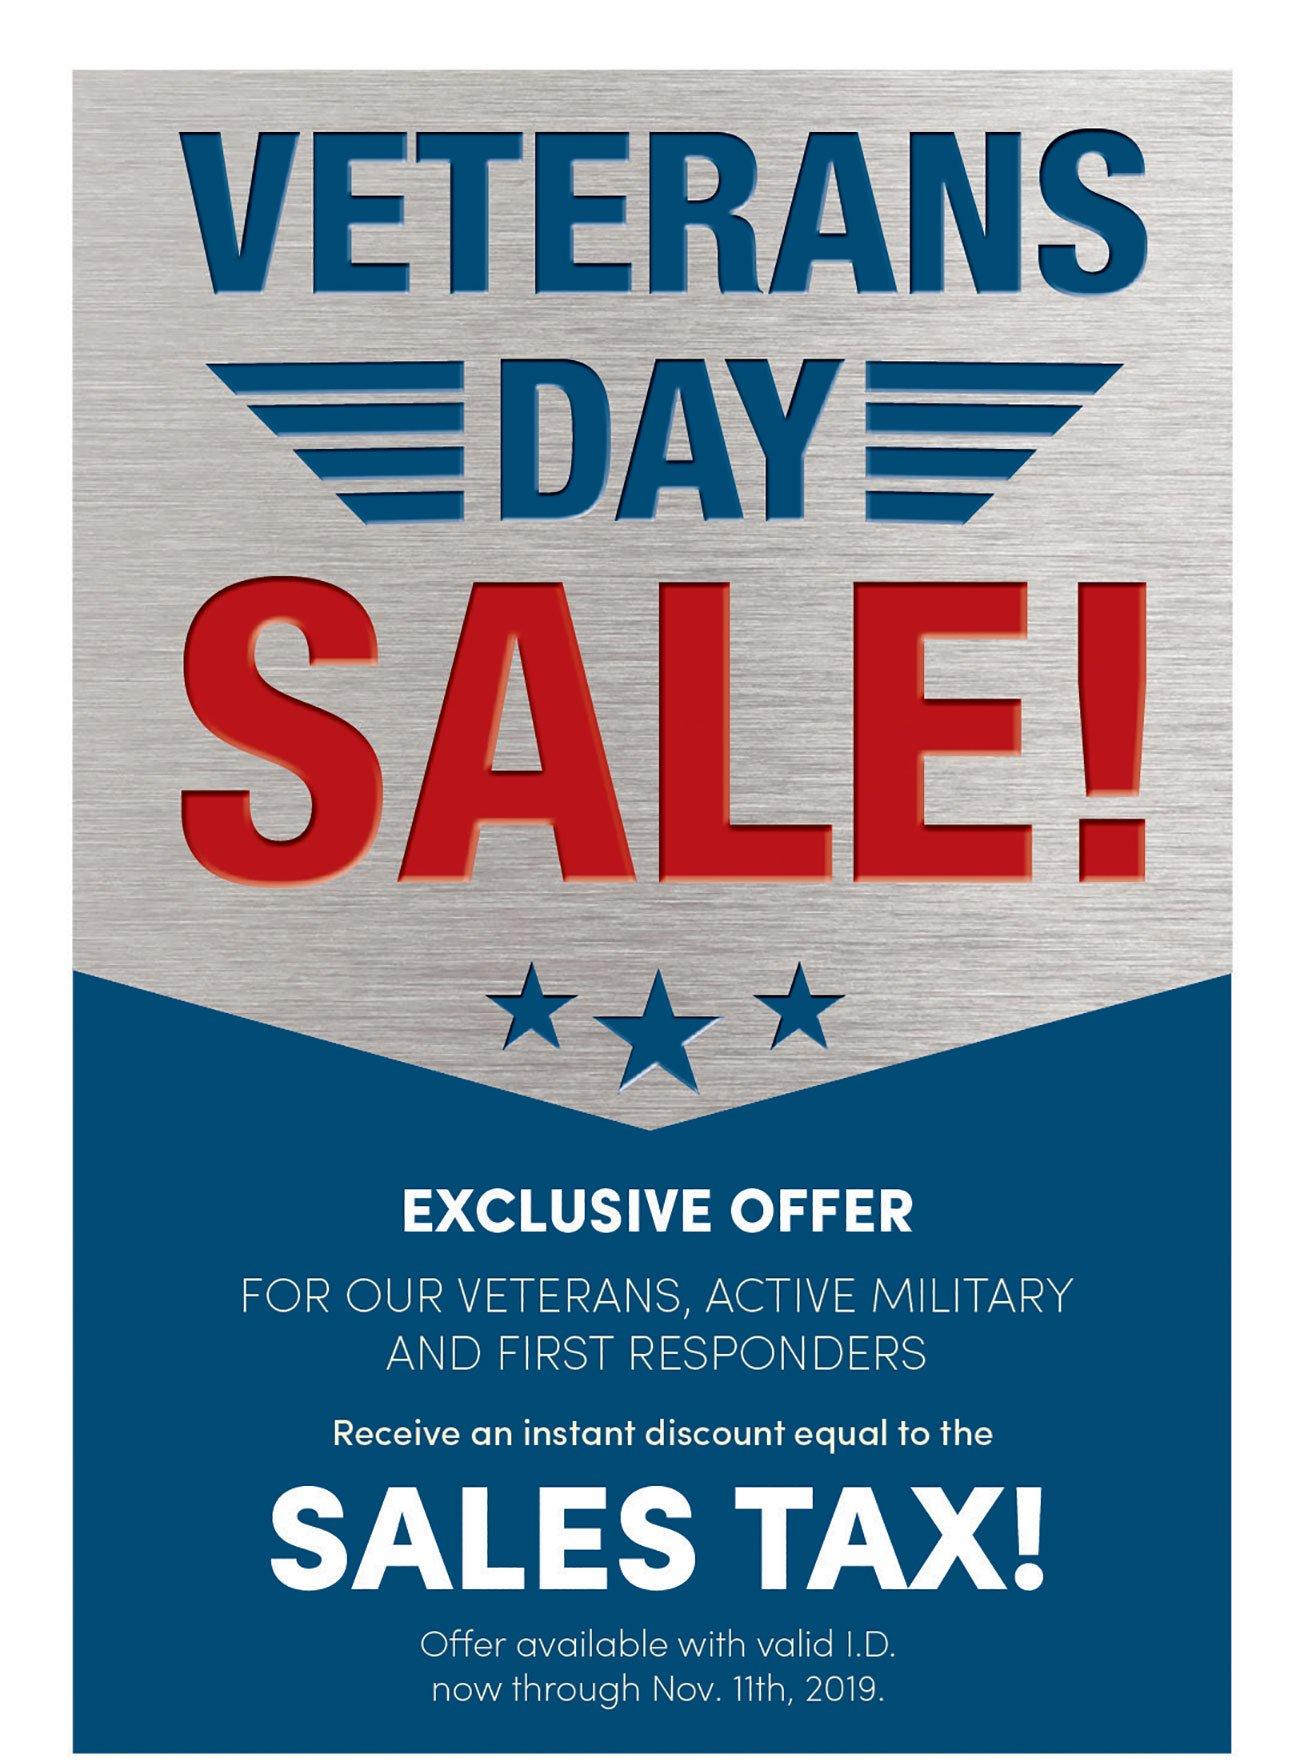 Veterans_Day_Sale